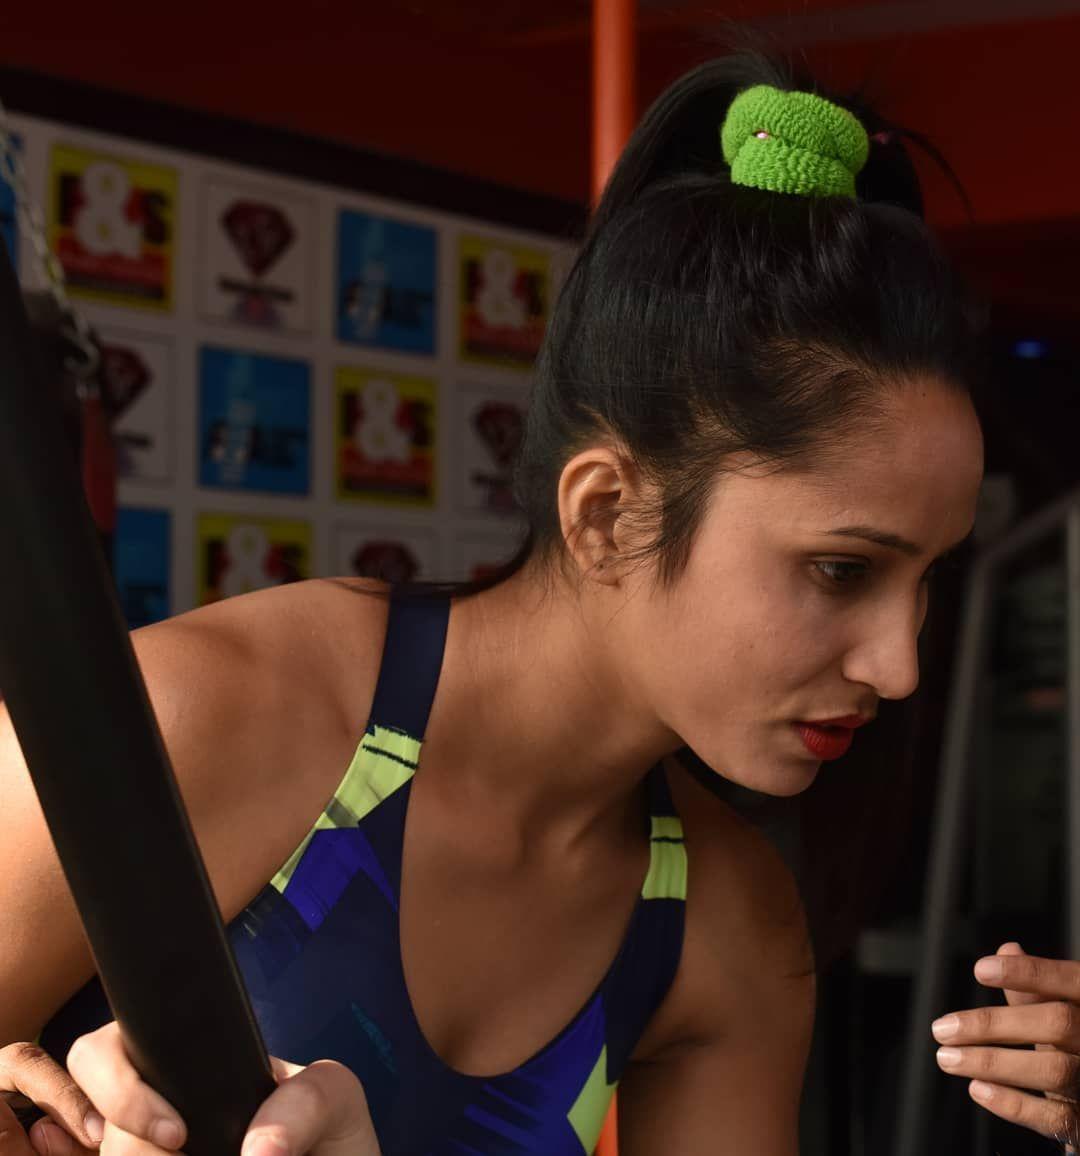 Monday Vibes #fitness #gymbady #workout #fitnessinspiration #hardtrainning#fitindiangirl  #gymkhana...